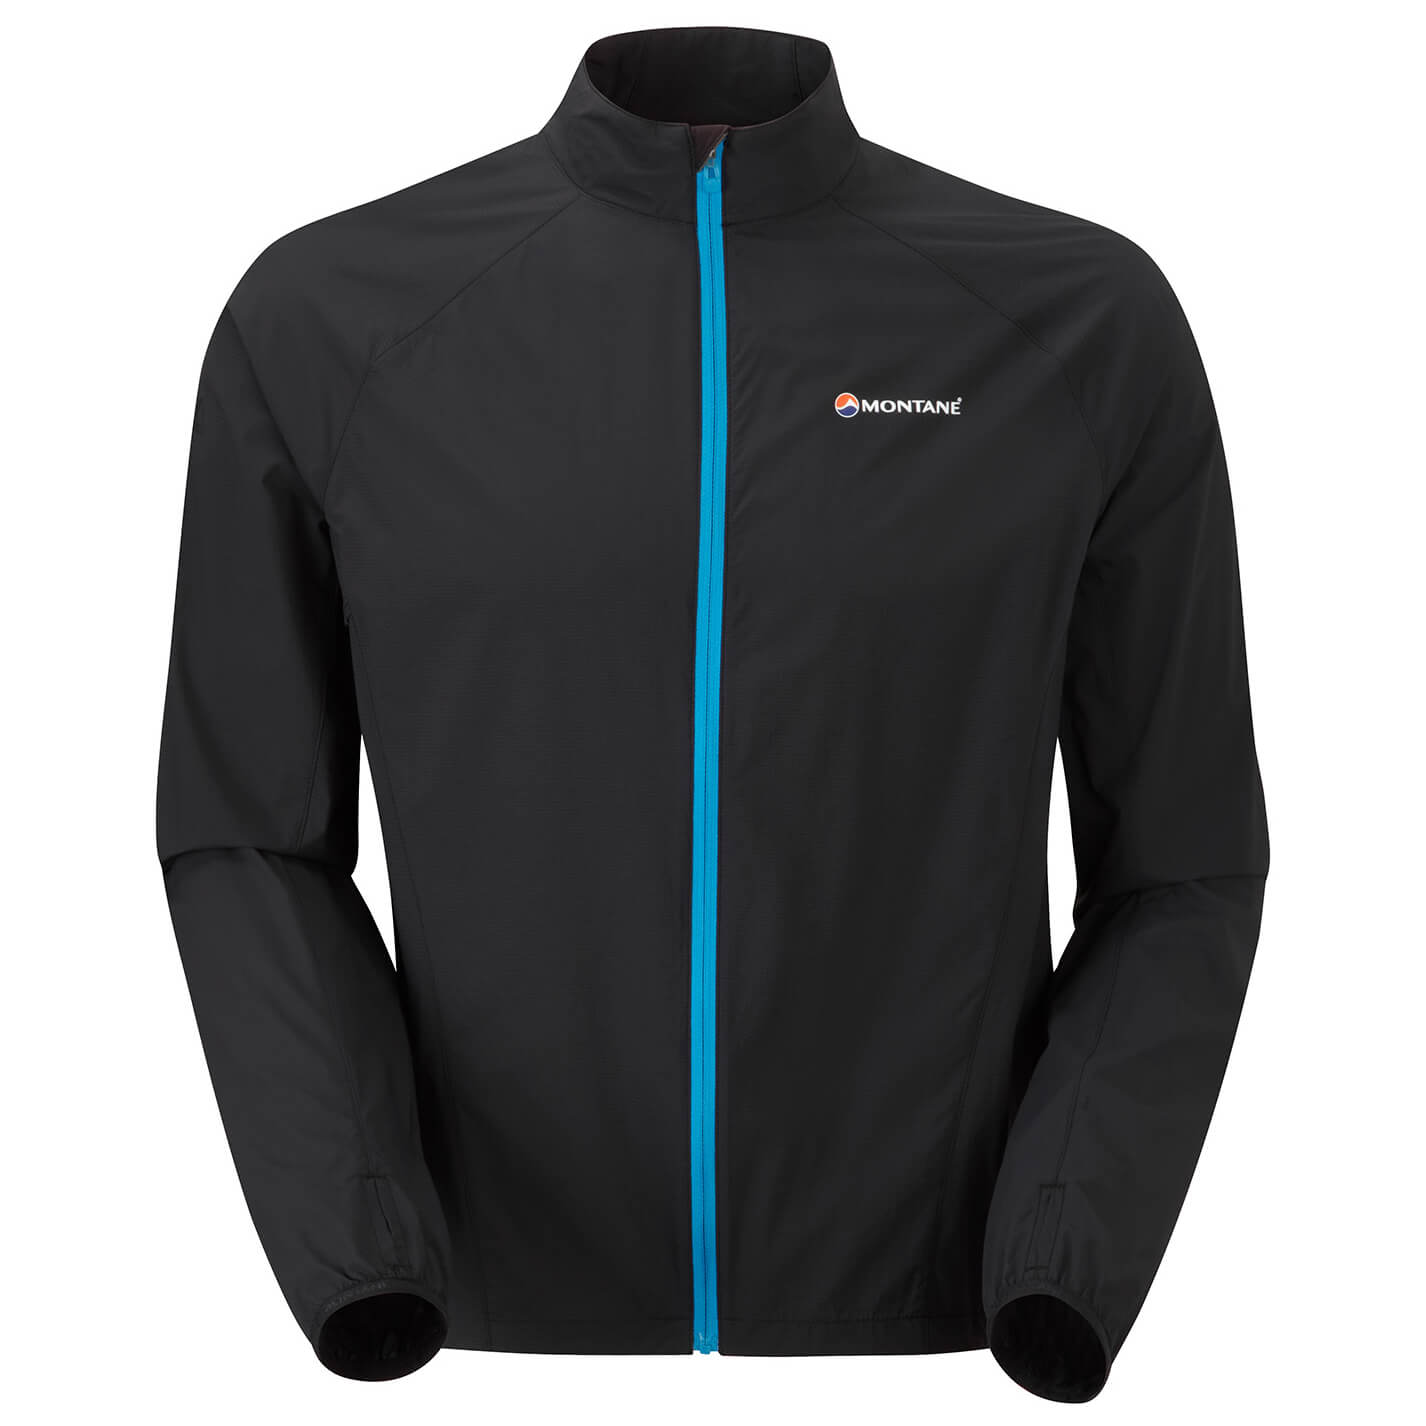 Montane Featherlite Trail Jacket Wind Jacket Men S Buy